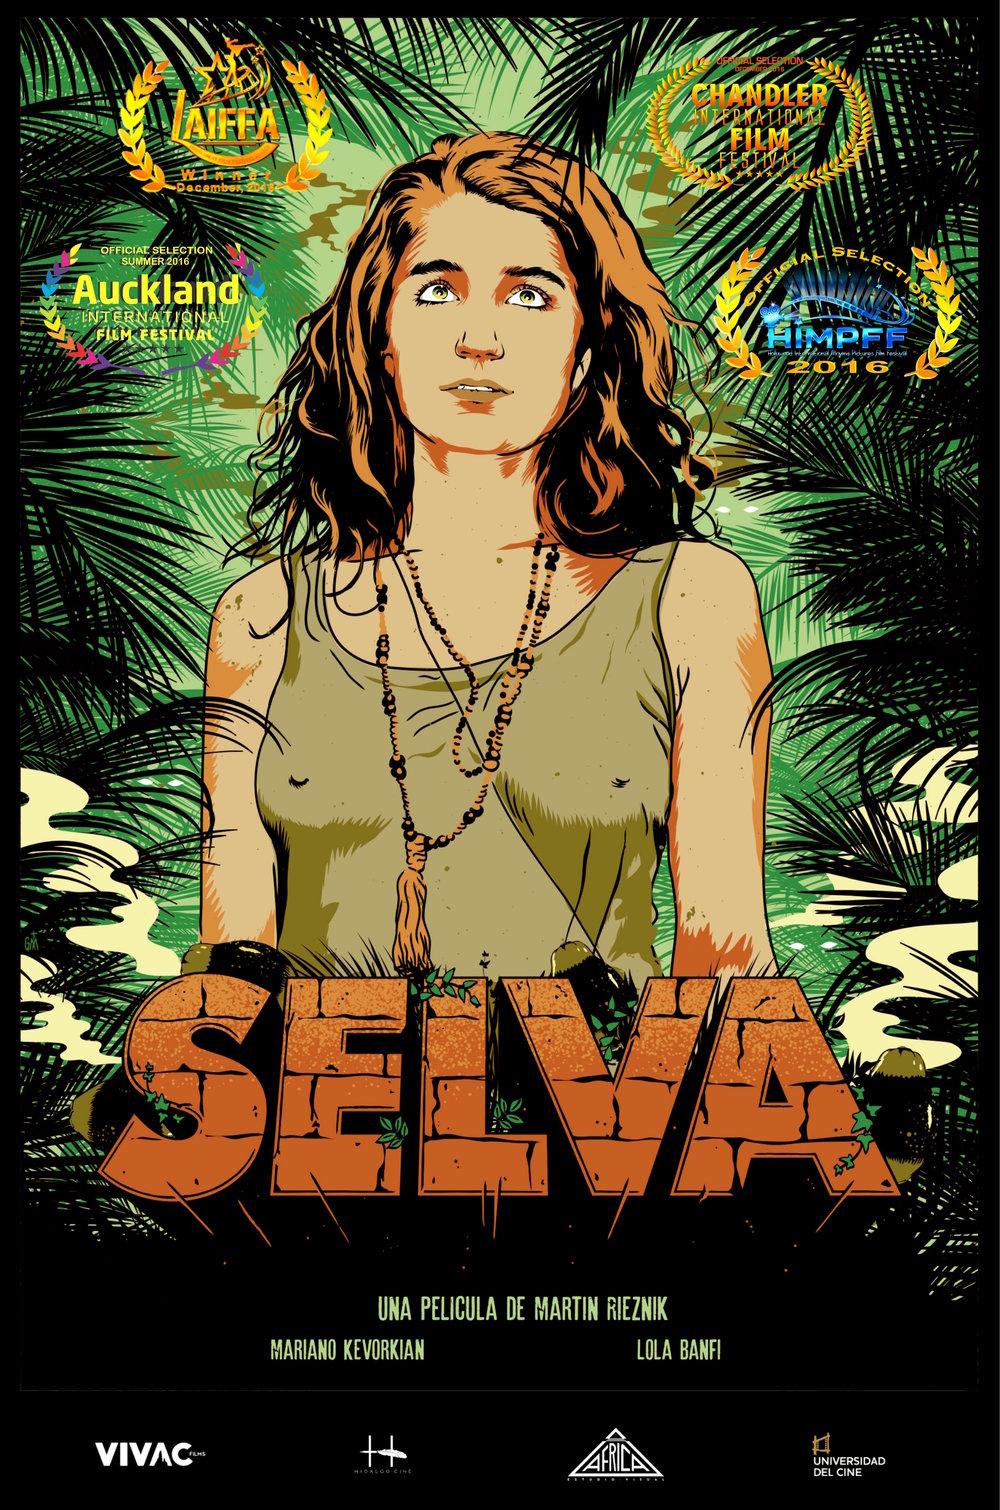 Auckland International Film Festival 2016